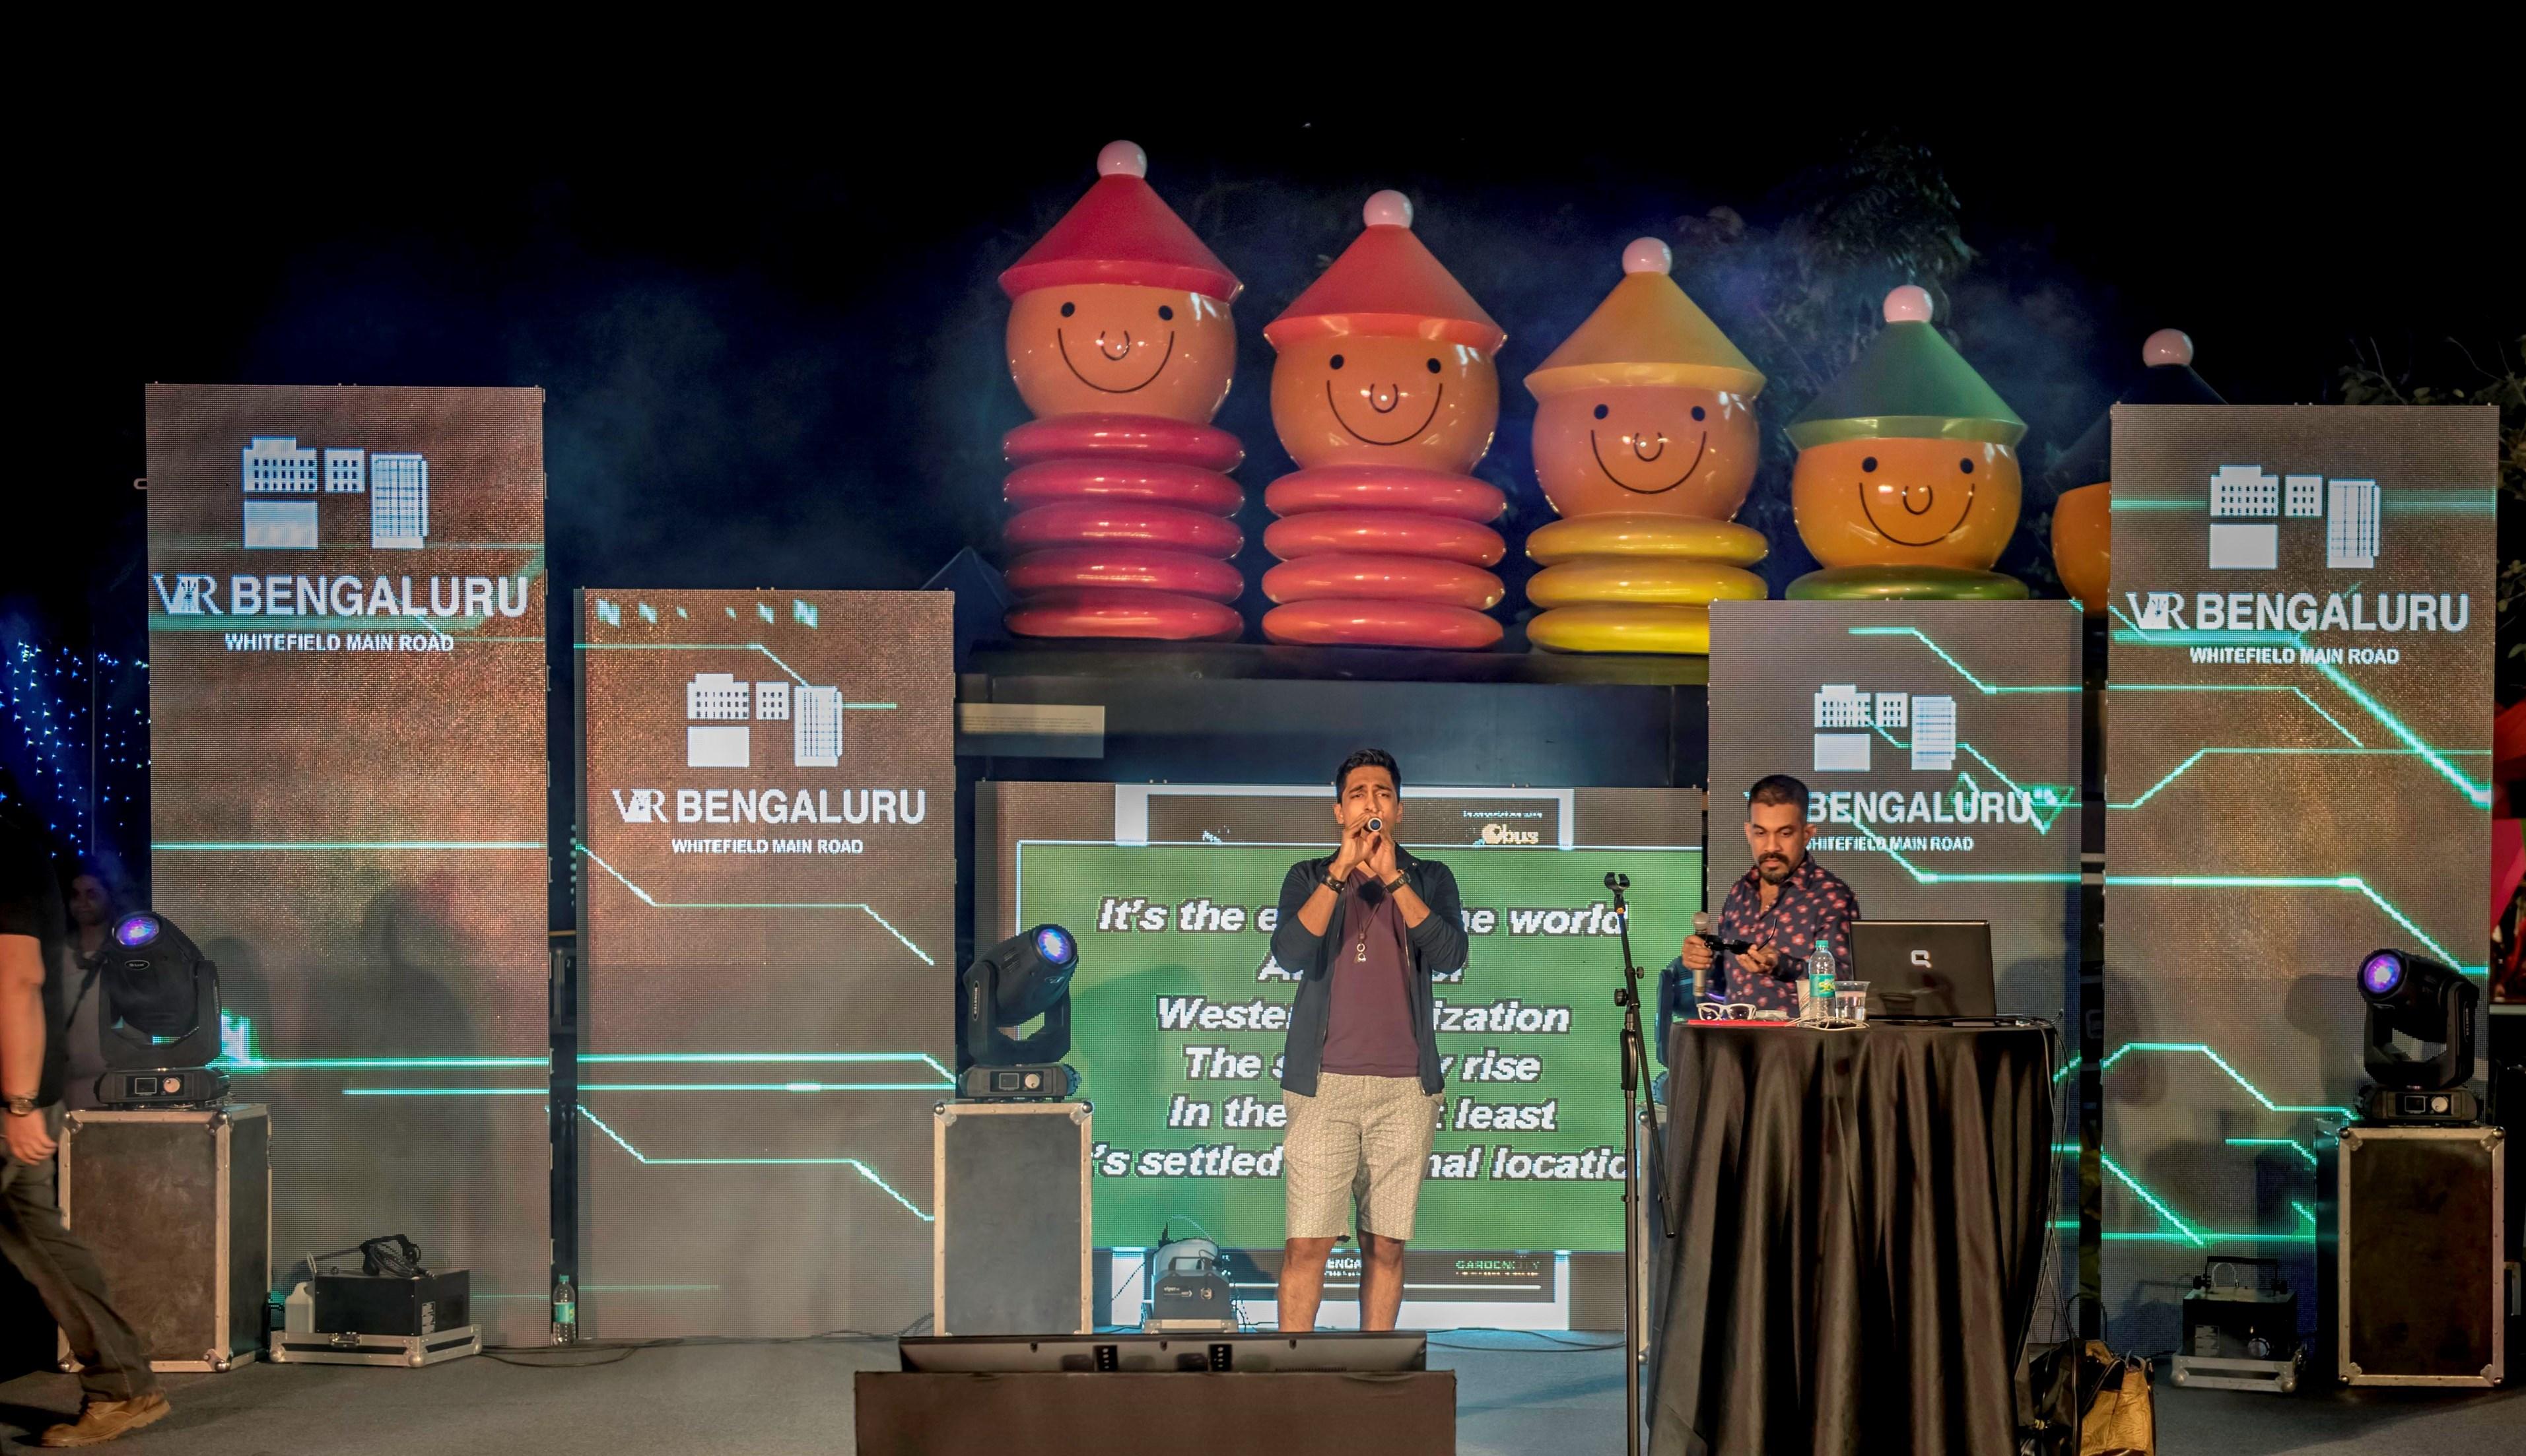 VR Bengaluru - Karaoke 2 the jeromy diaries (3826 x 2206)